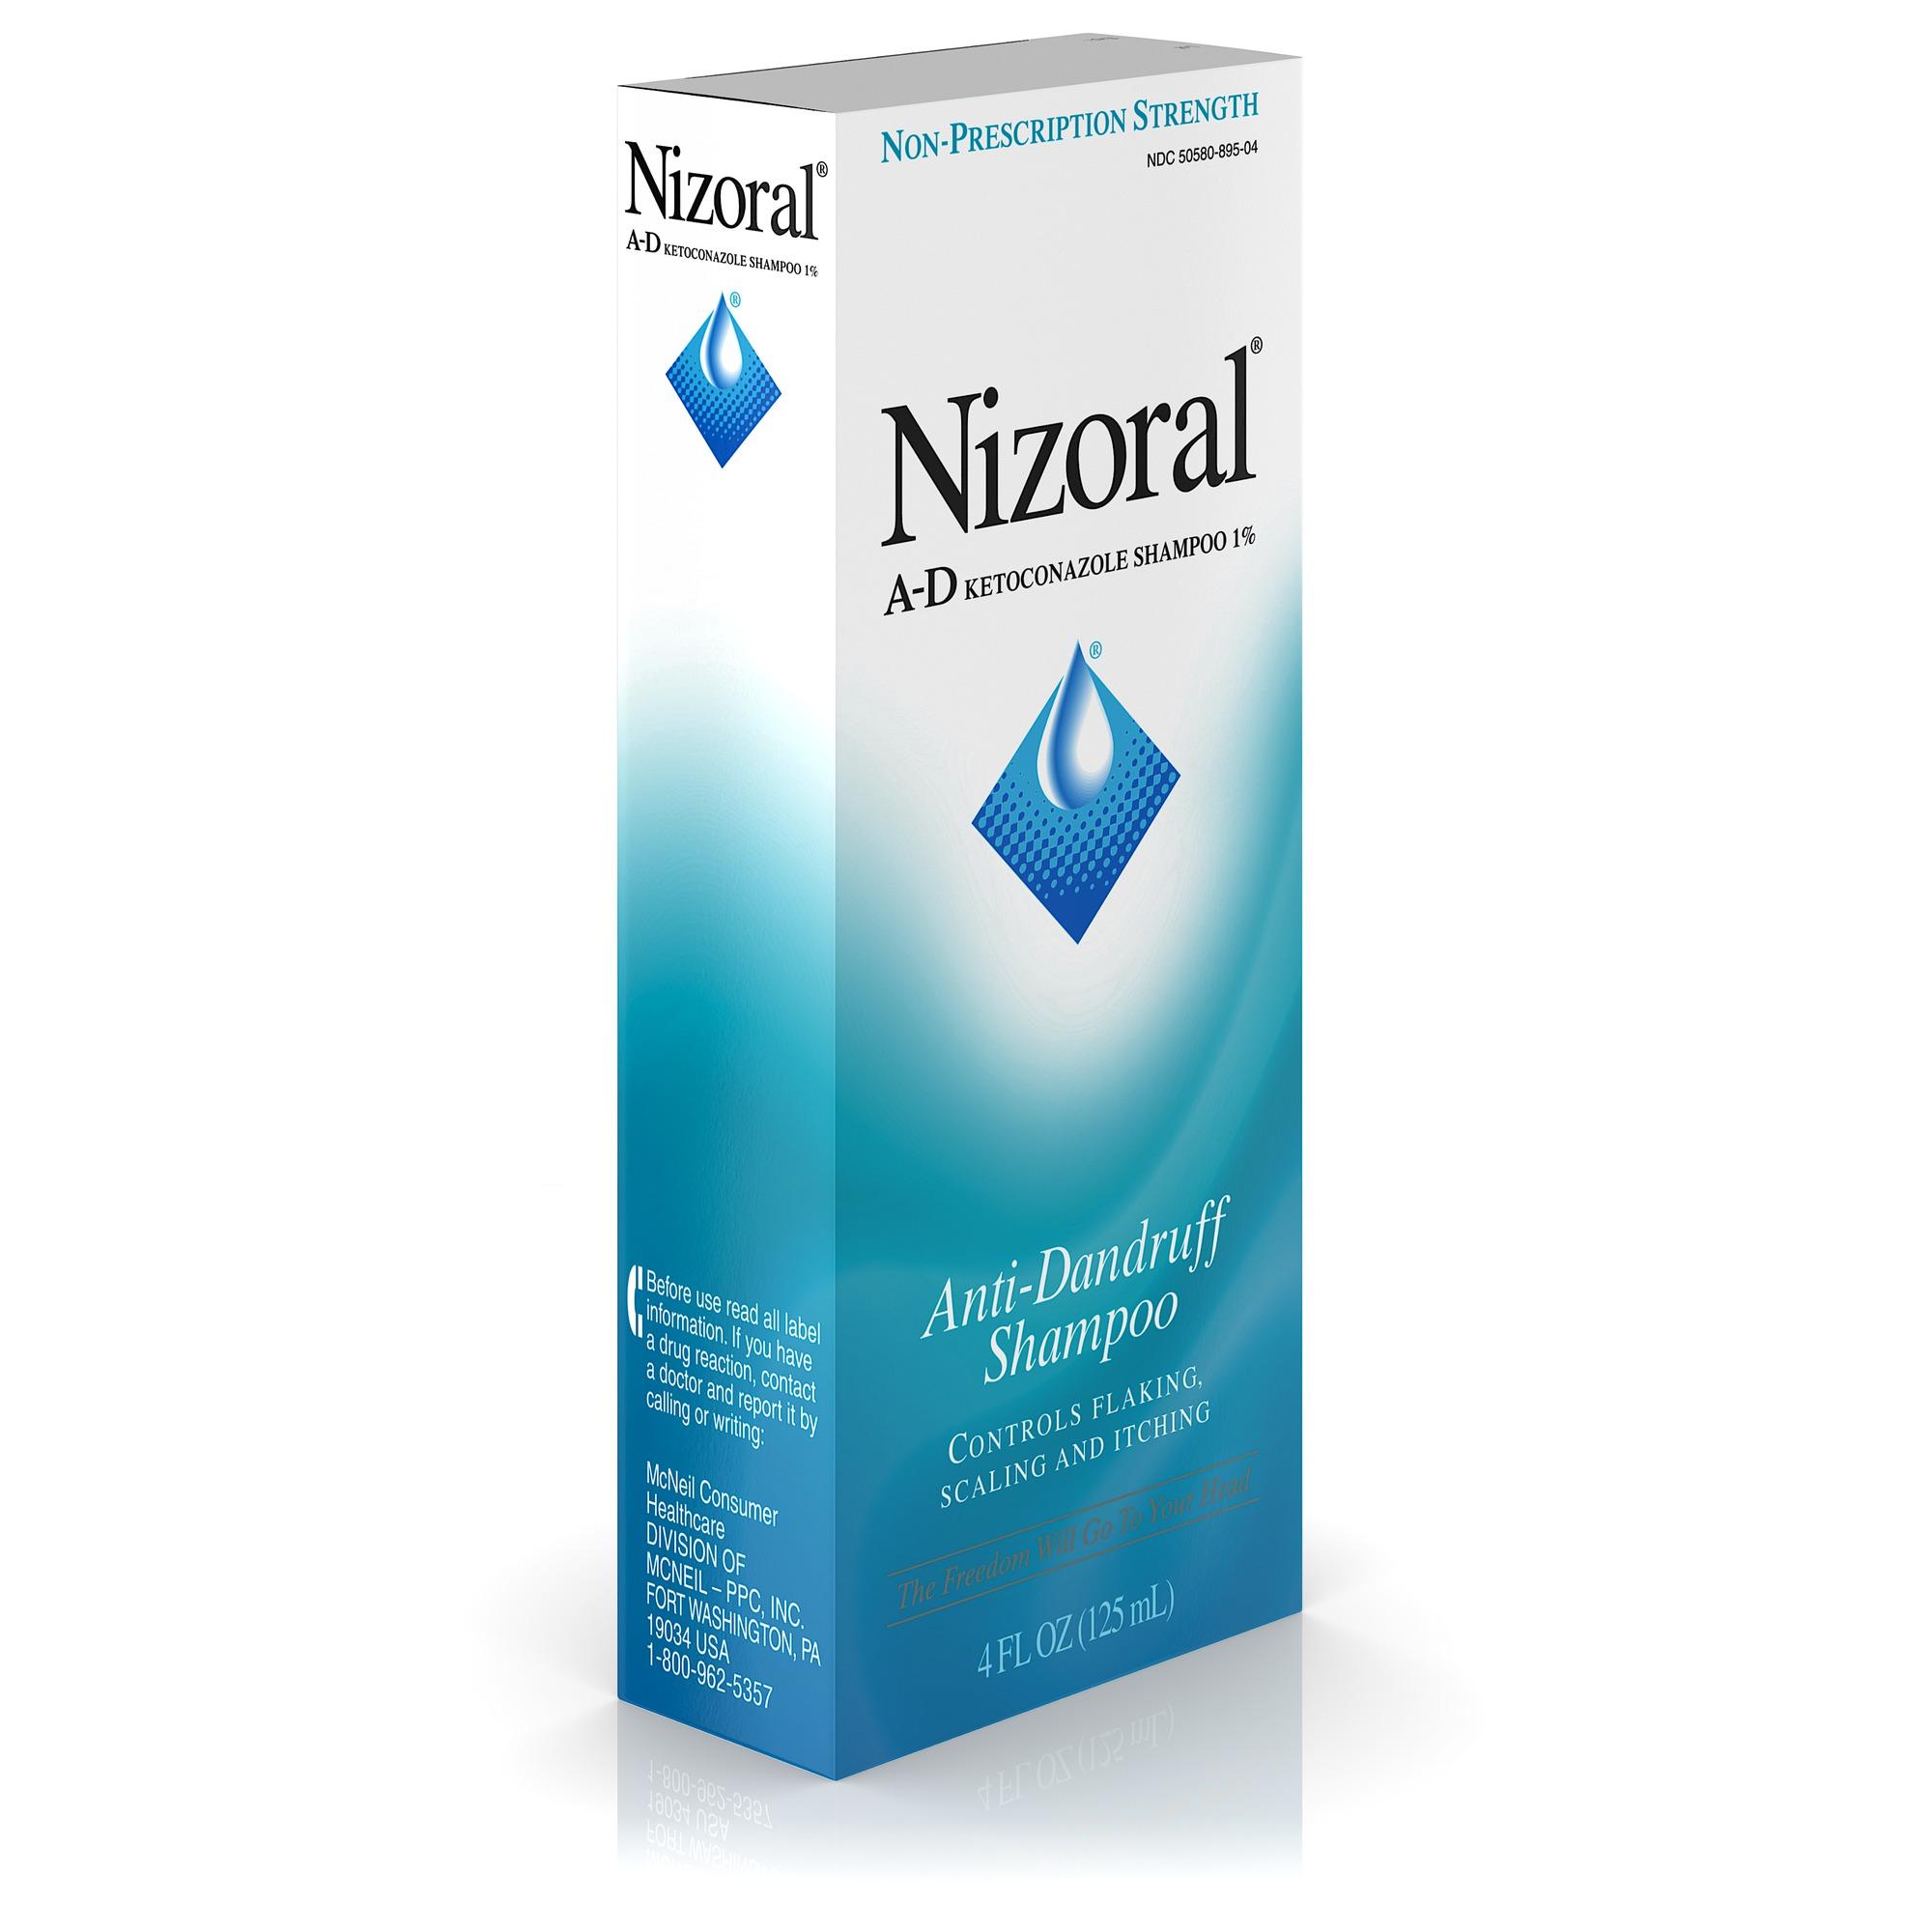 nizoral a d anti dandruff shampoo with ketoconazole 1 4 fl oz